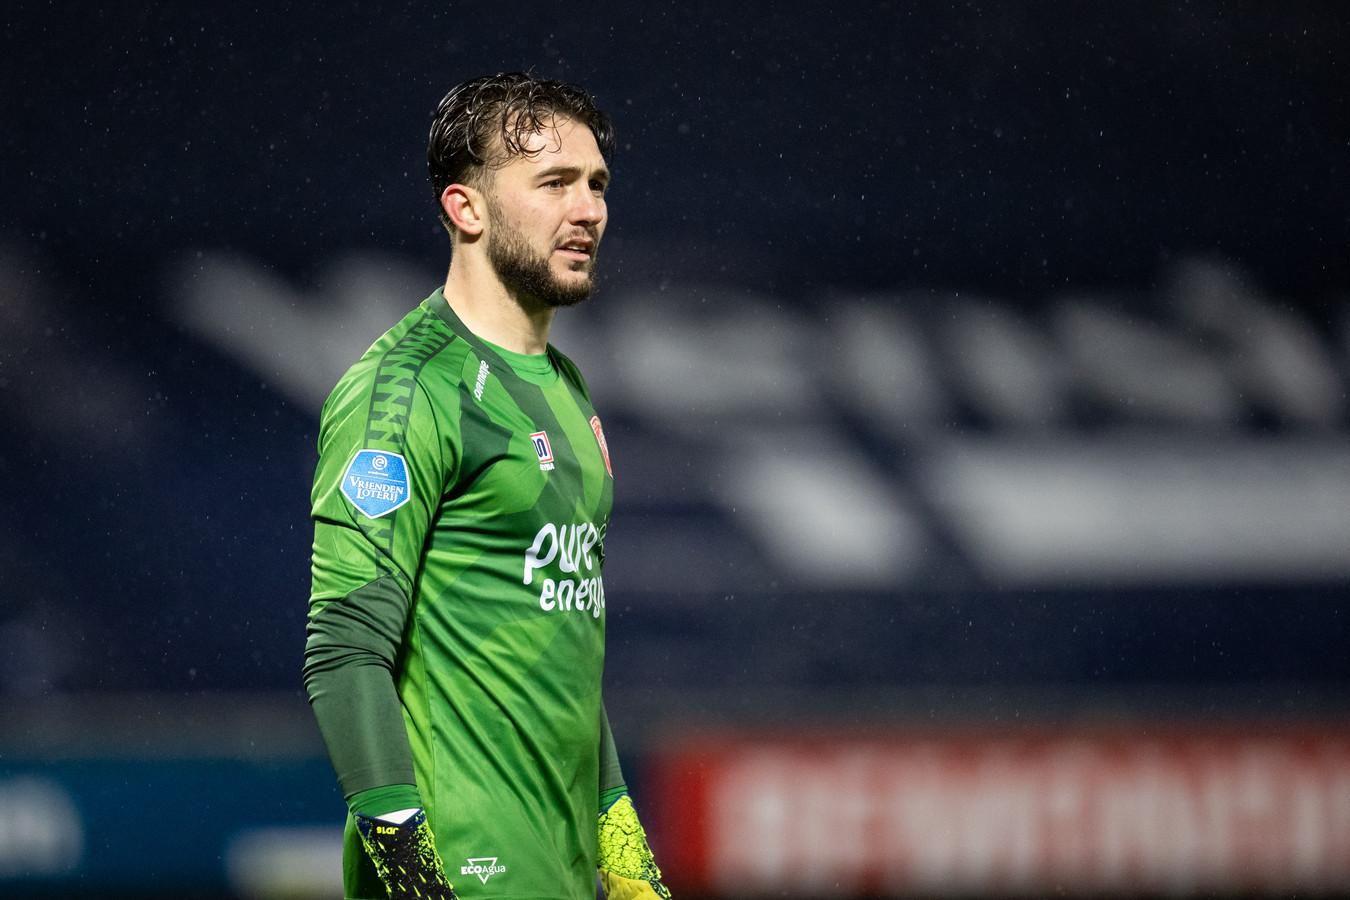 Joël Drommel in het shirt van FC Twente.